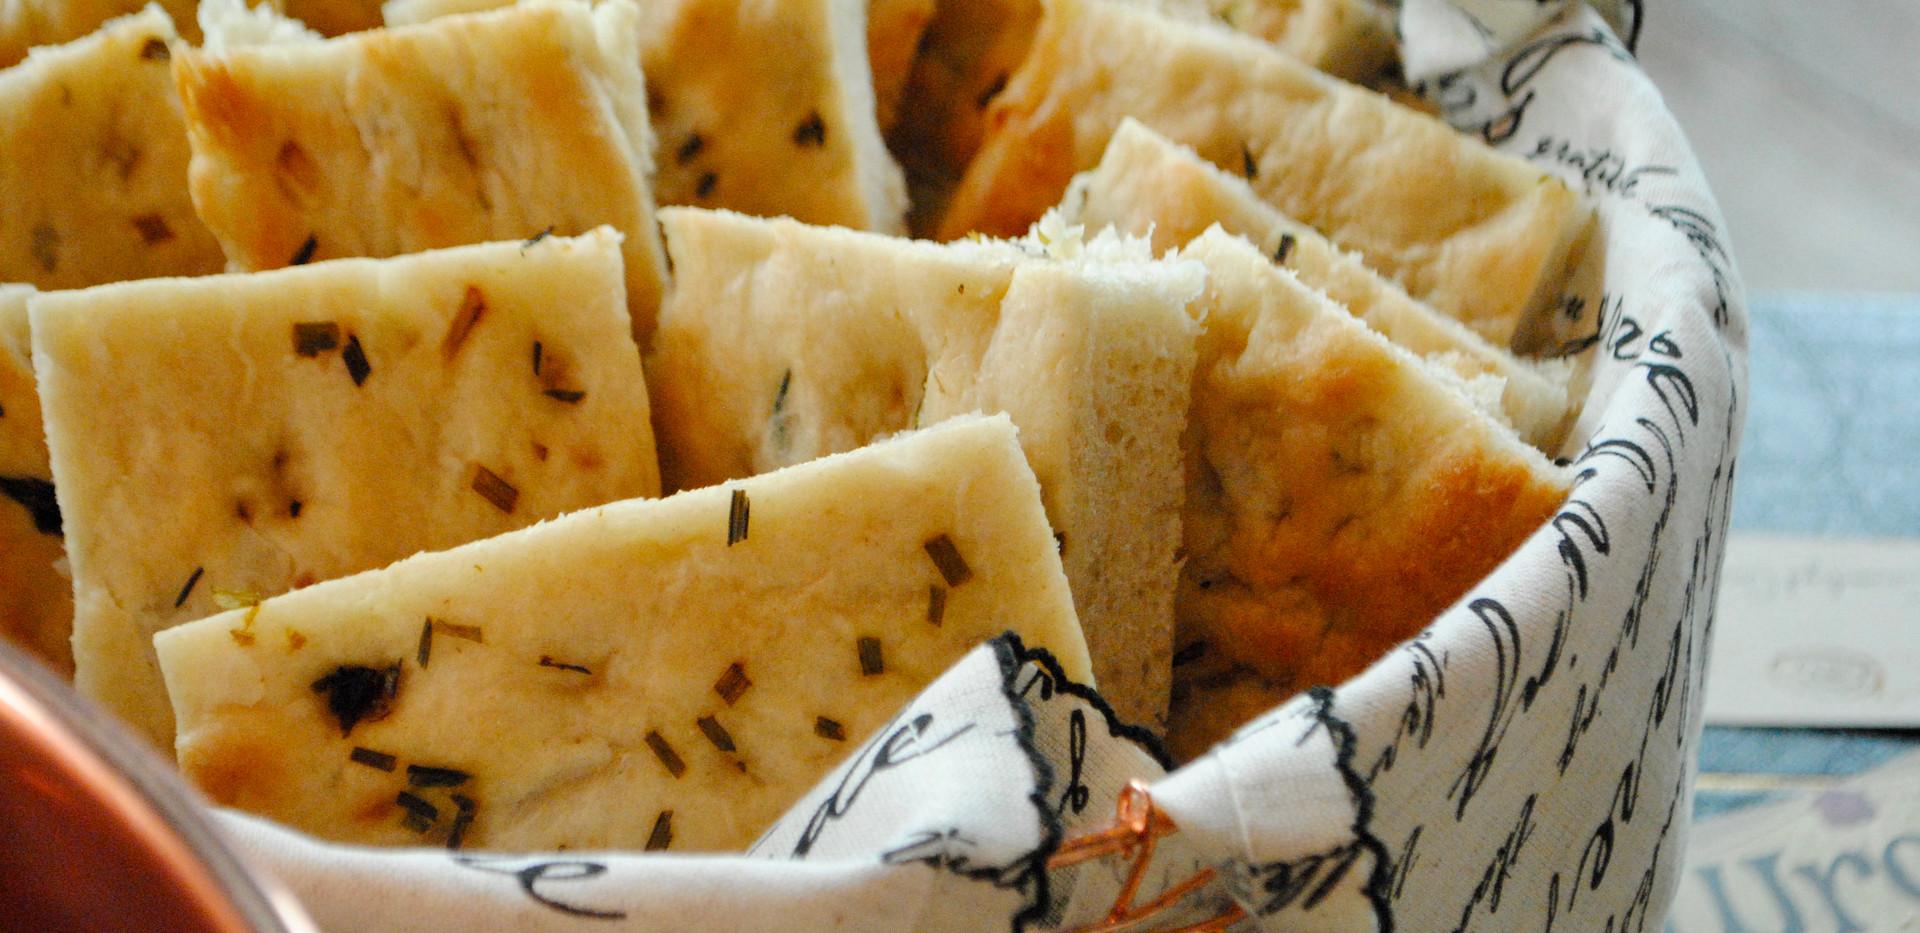 Herbed Foccacia Bread | Unbeatable homemade taste